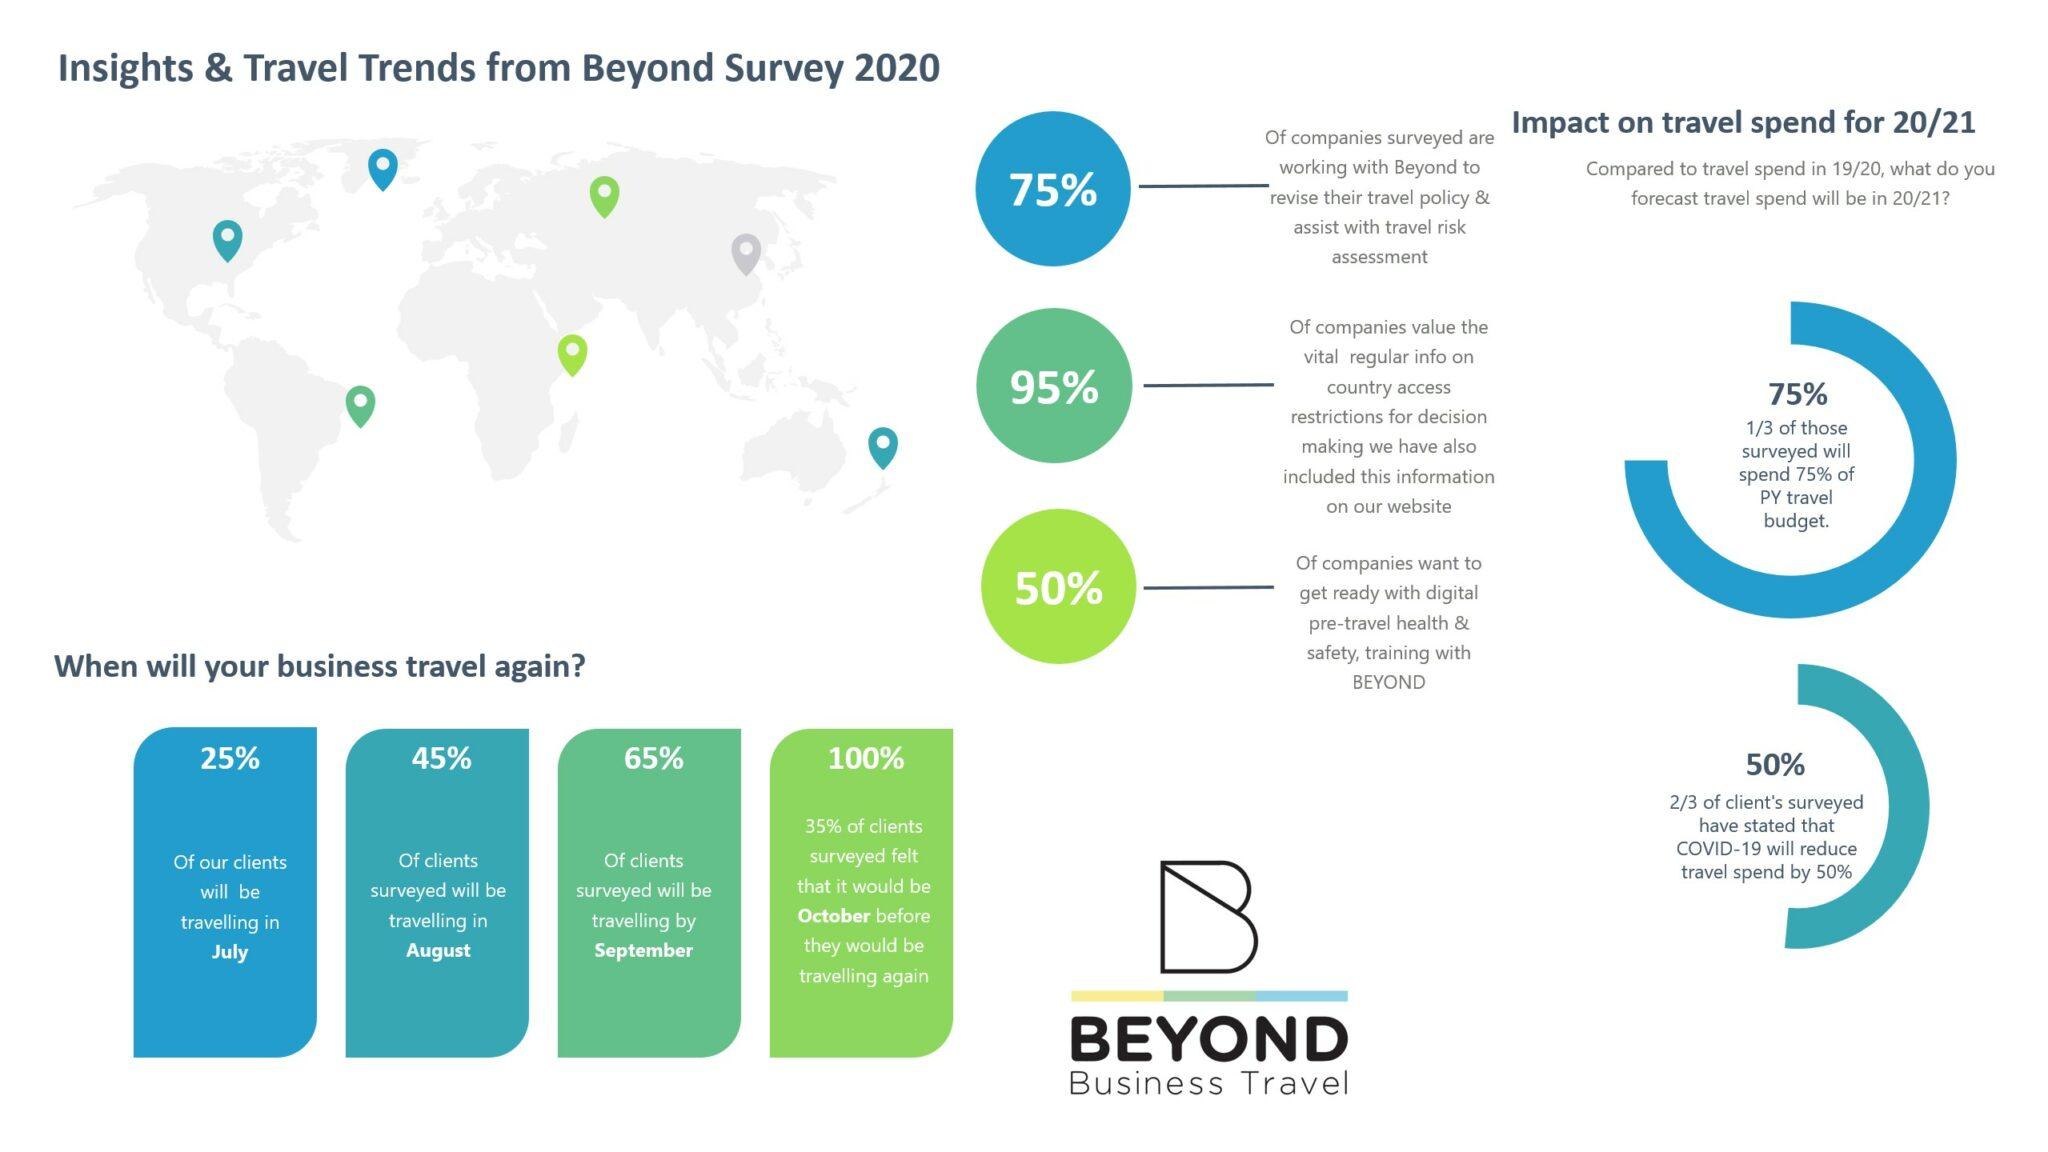 Insights & Travel Trends survey